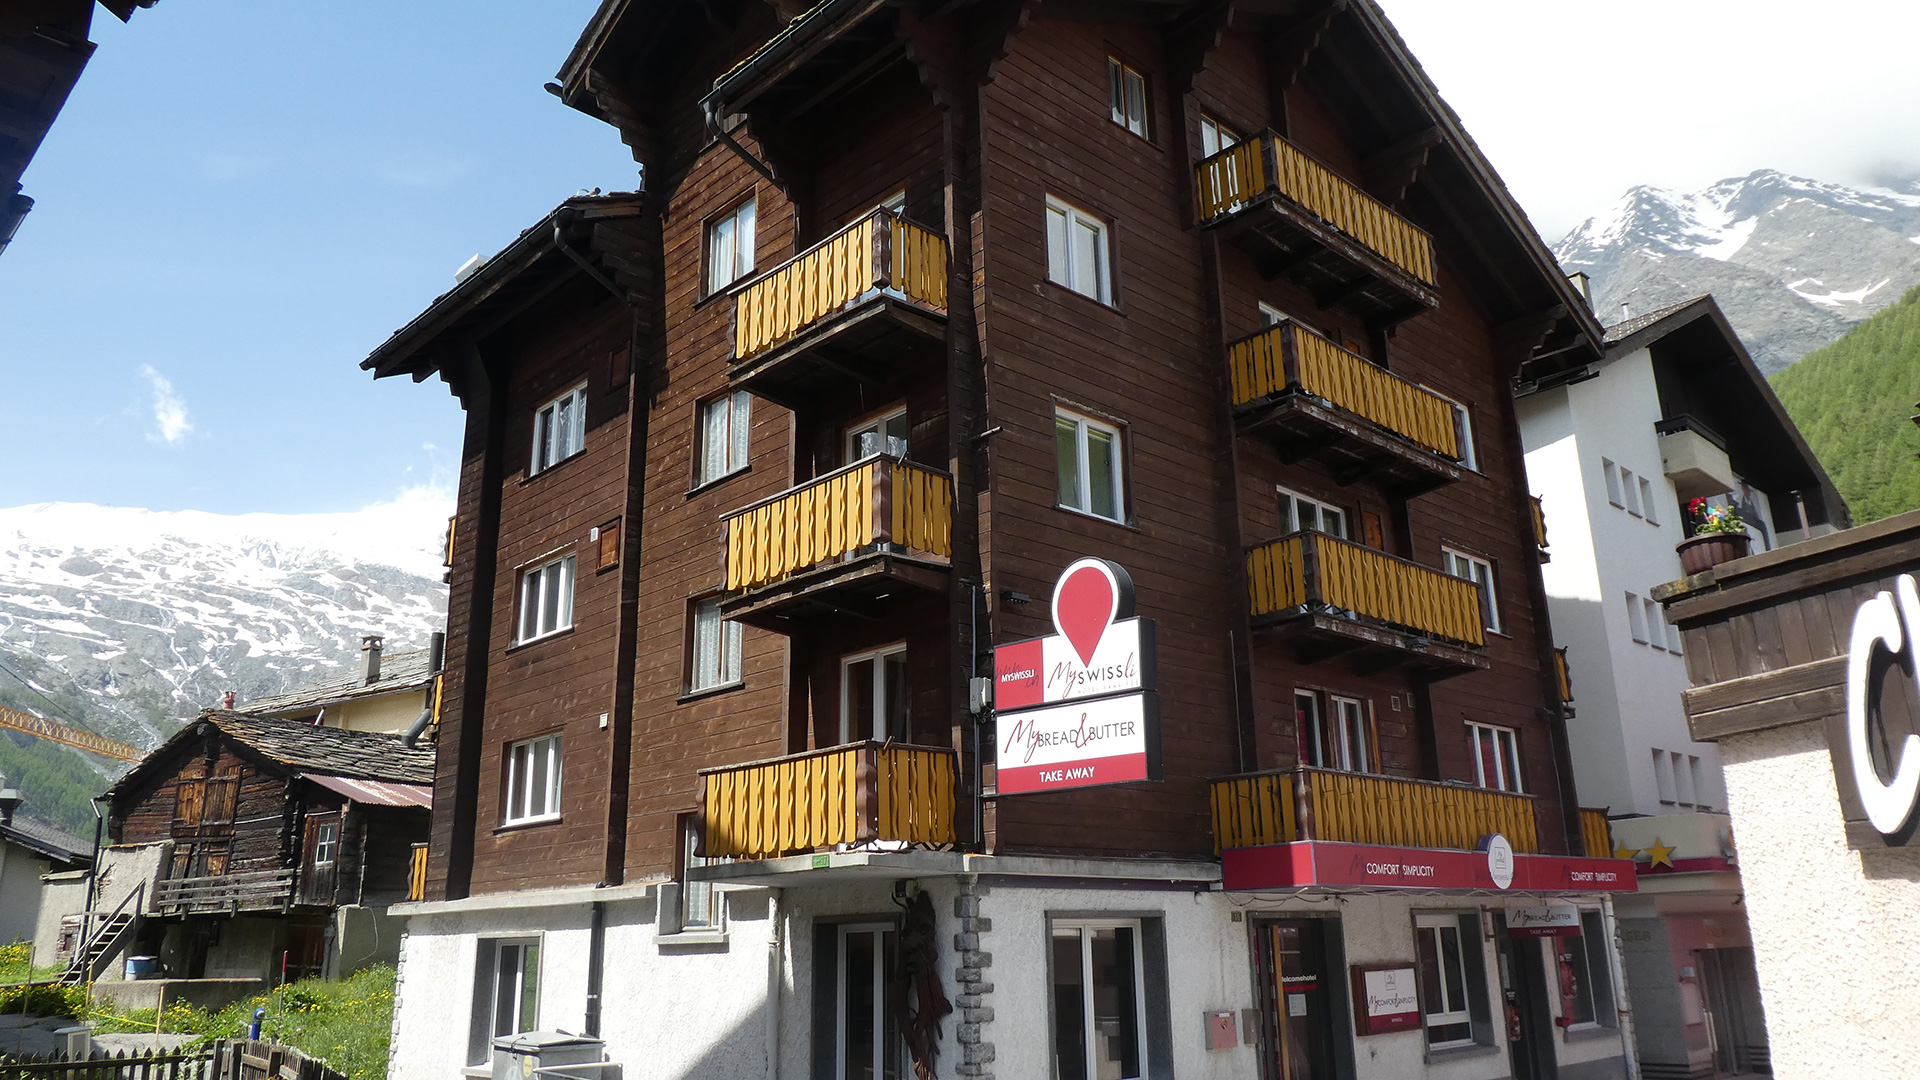 Hotel Bergheimat Hotel, Switzerland